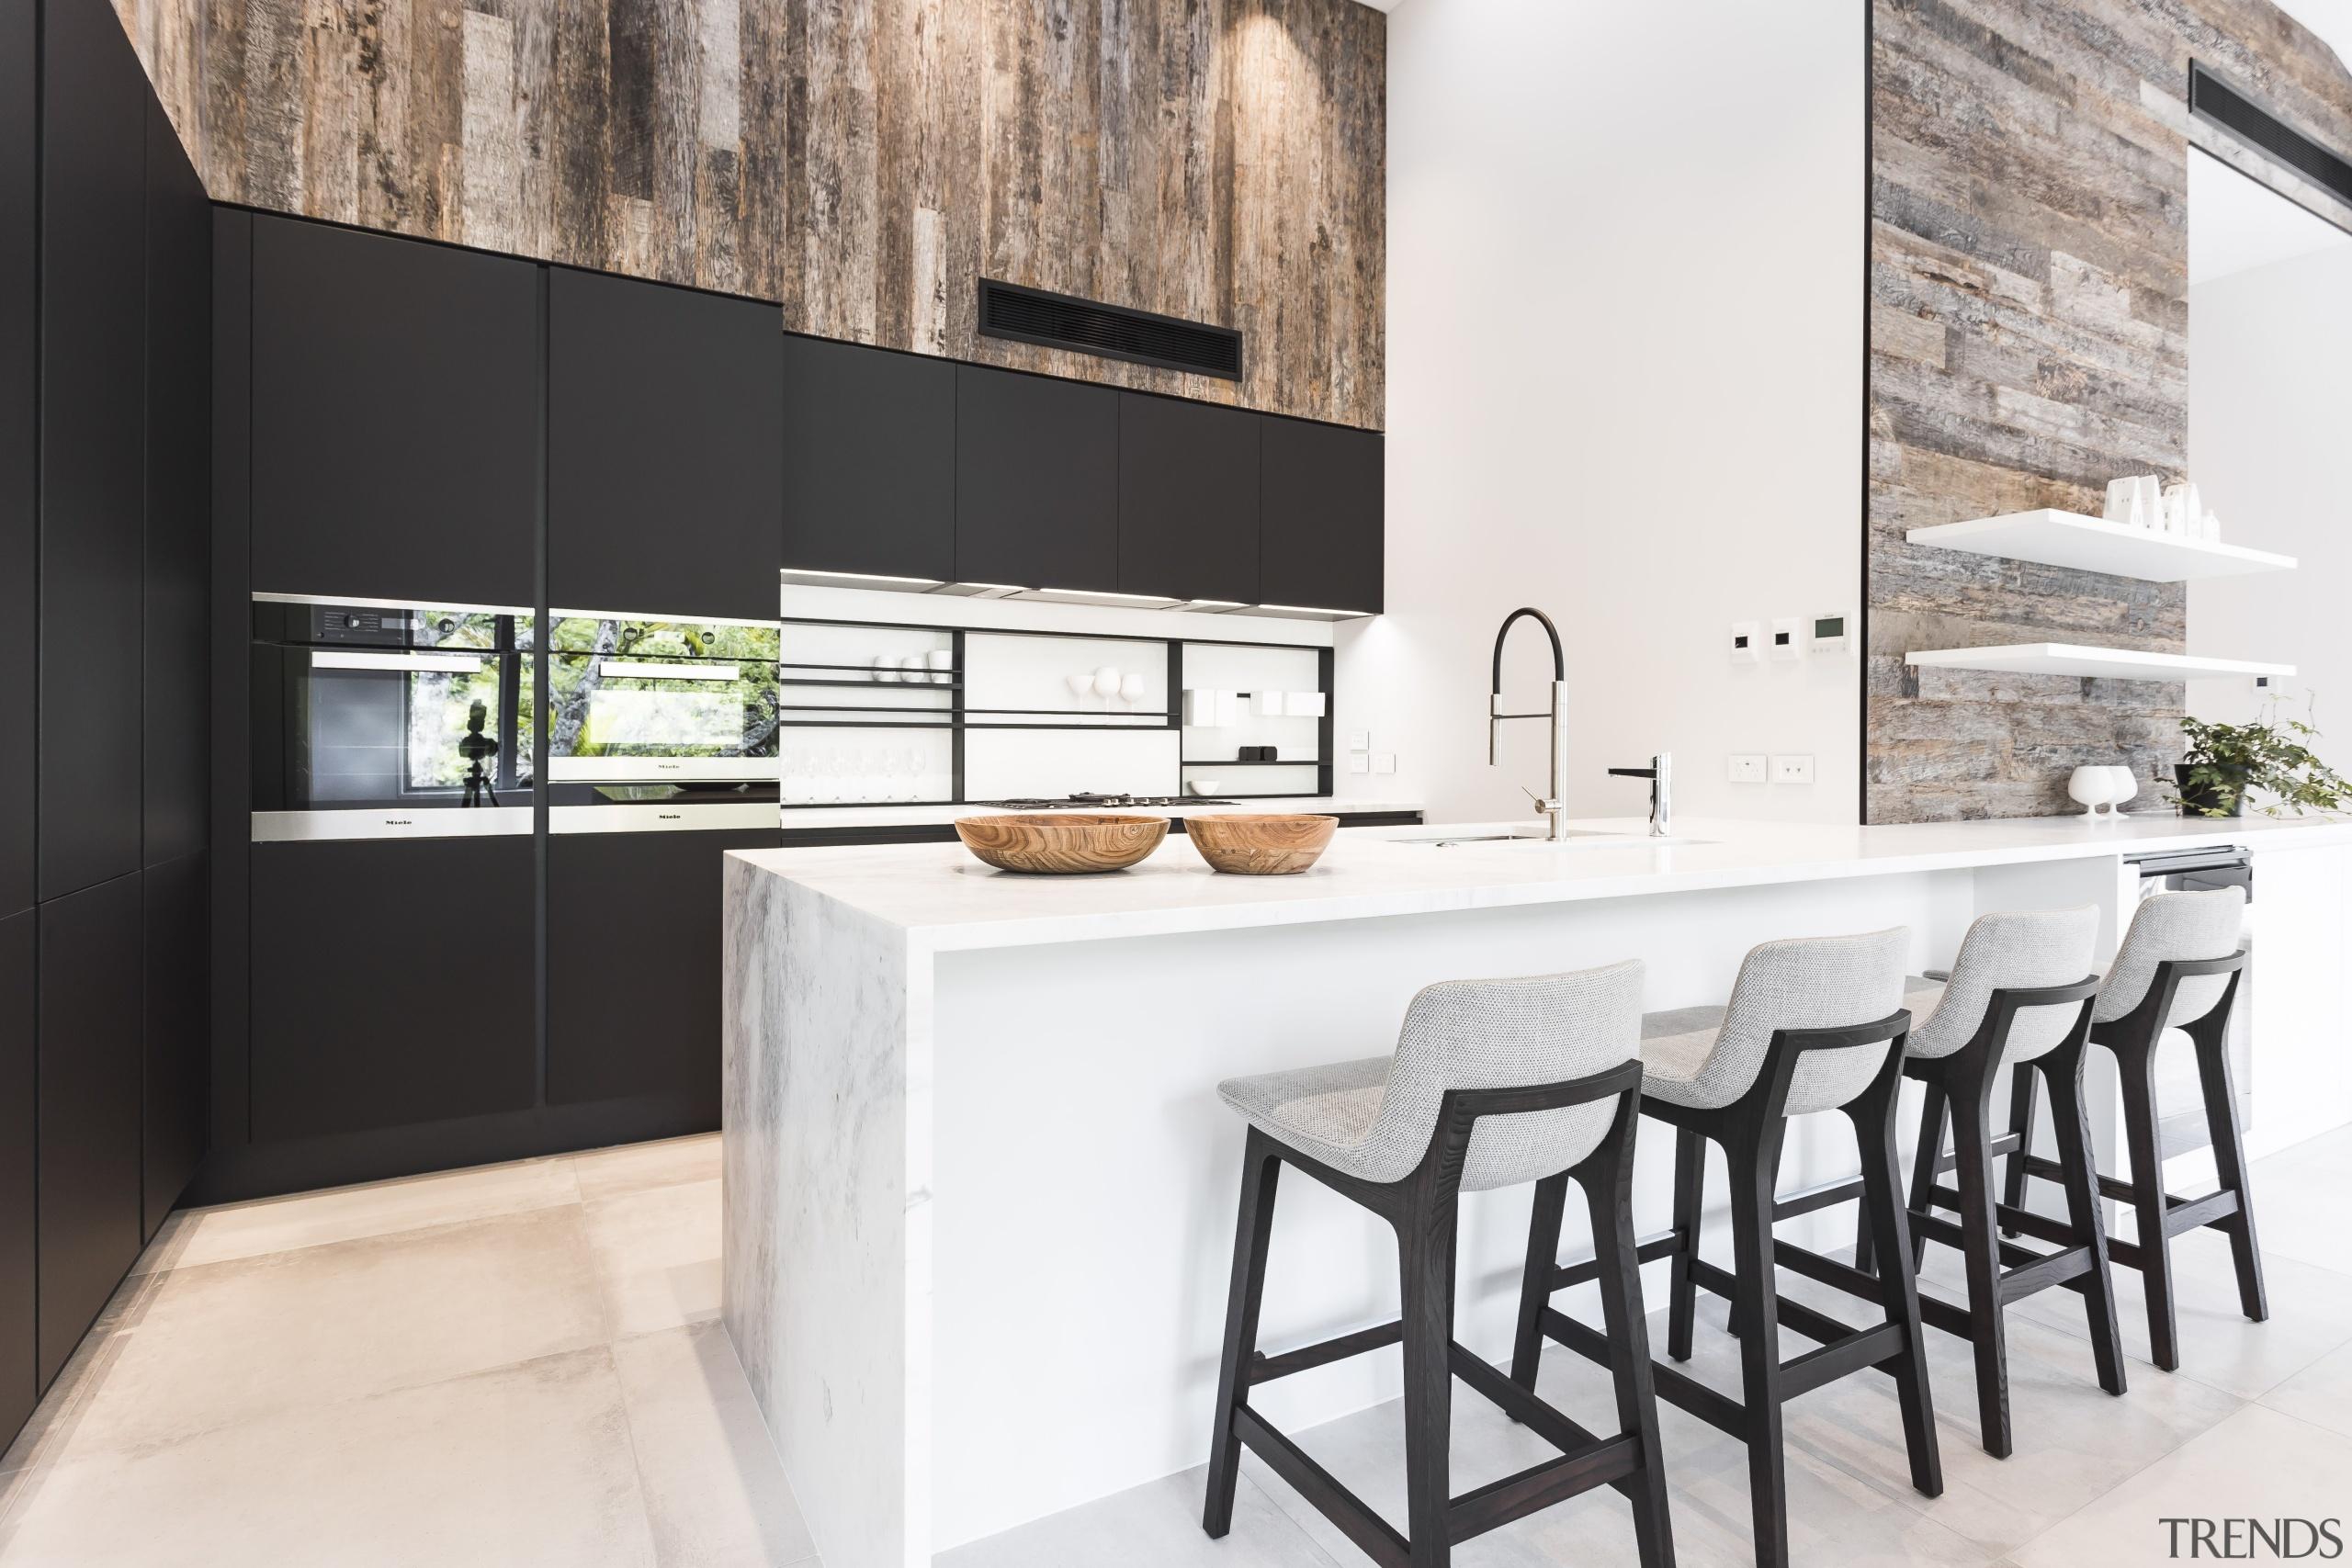 Antique wood panelling used in the living area countertop, cuisine classique, furniture, interior design, kitchen, white, black